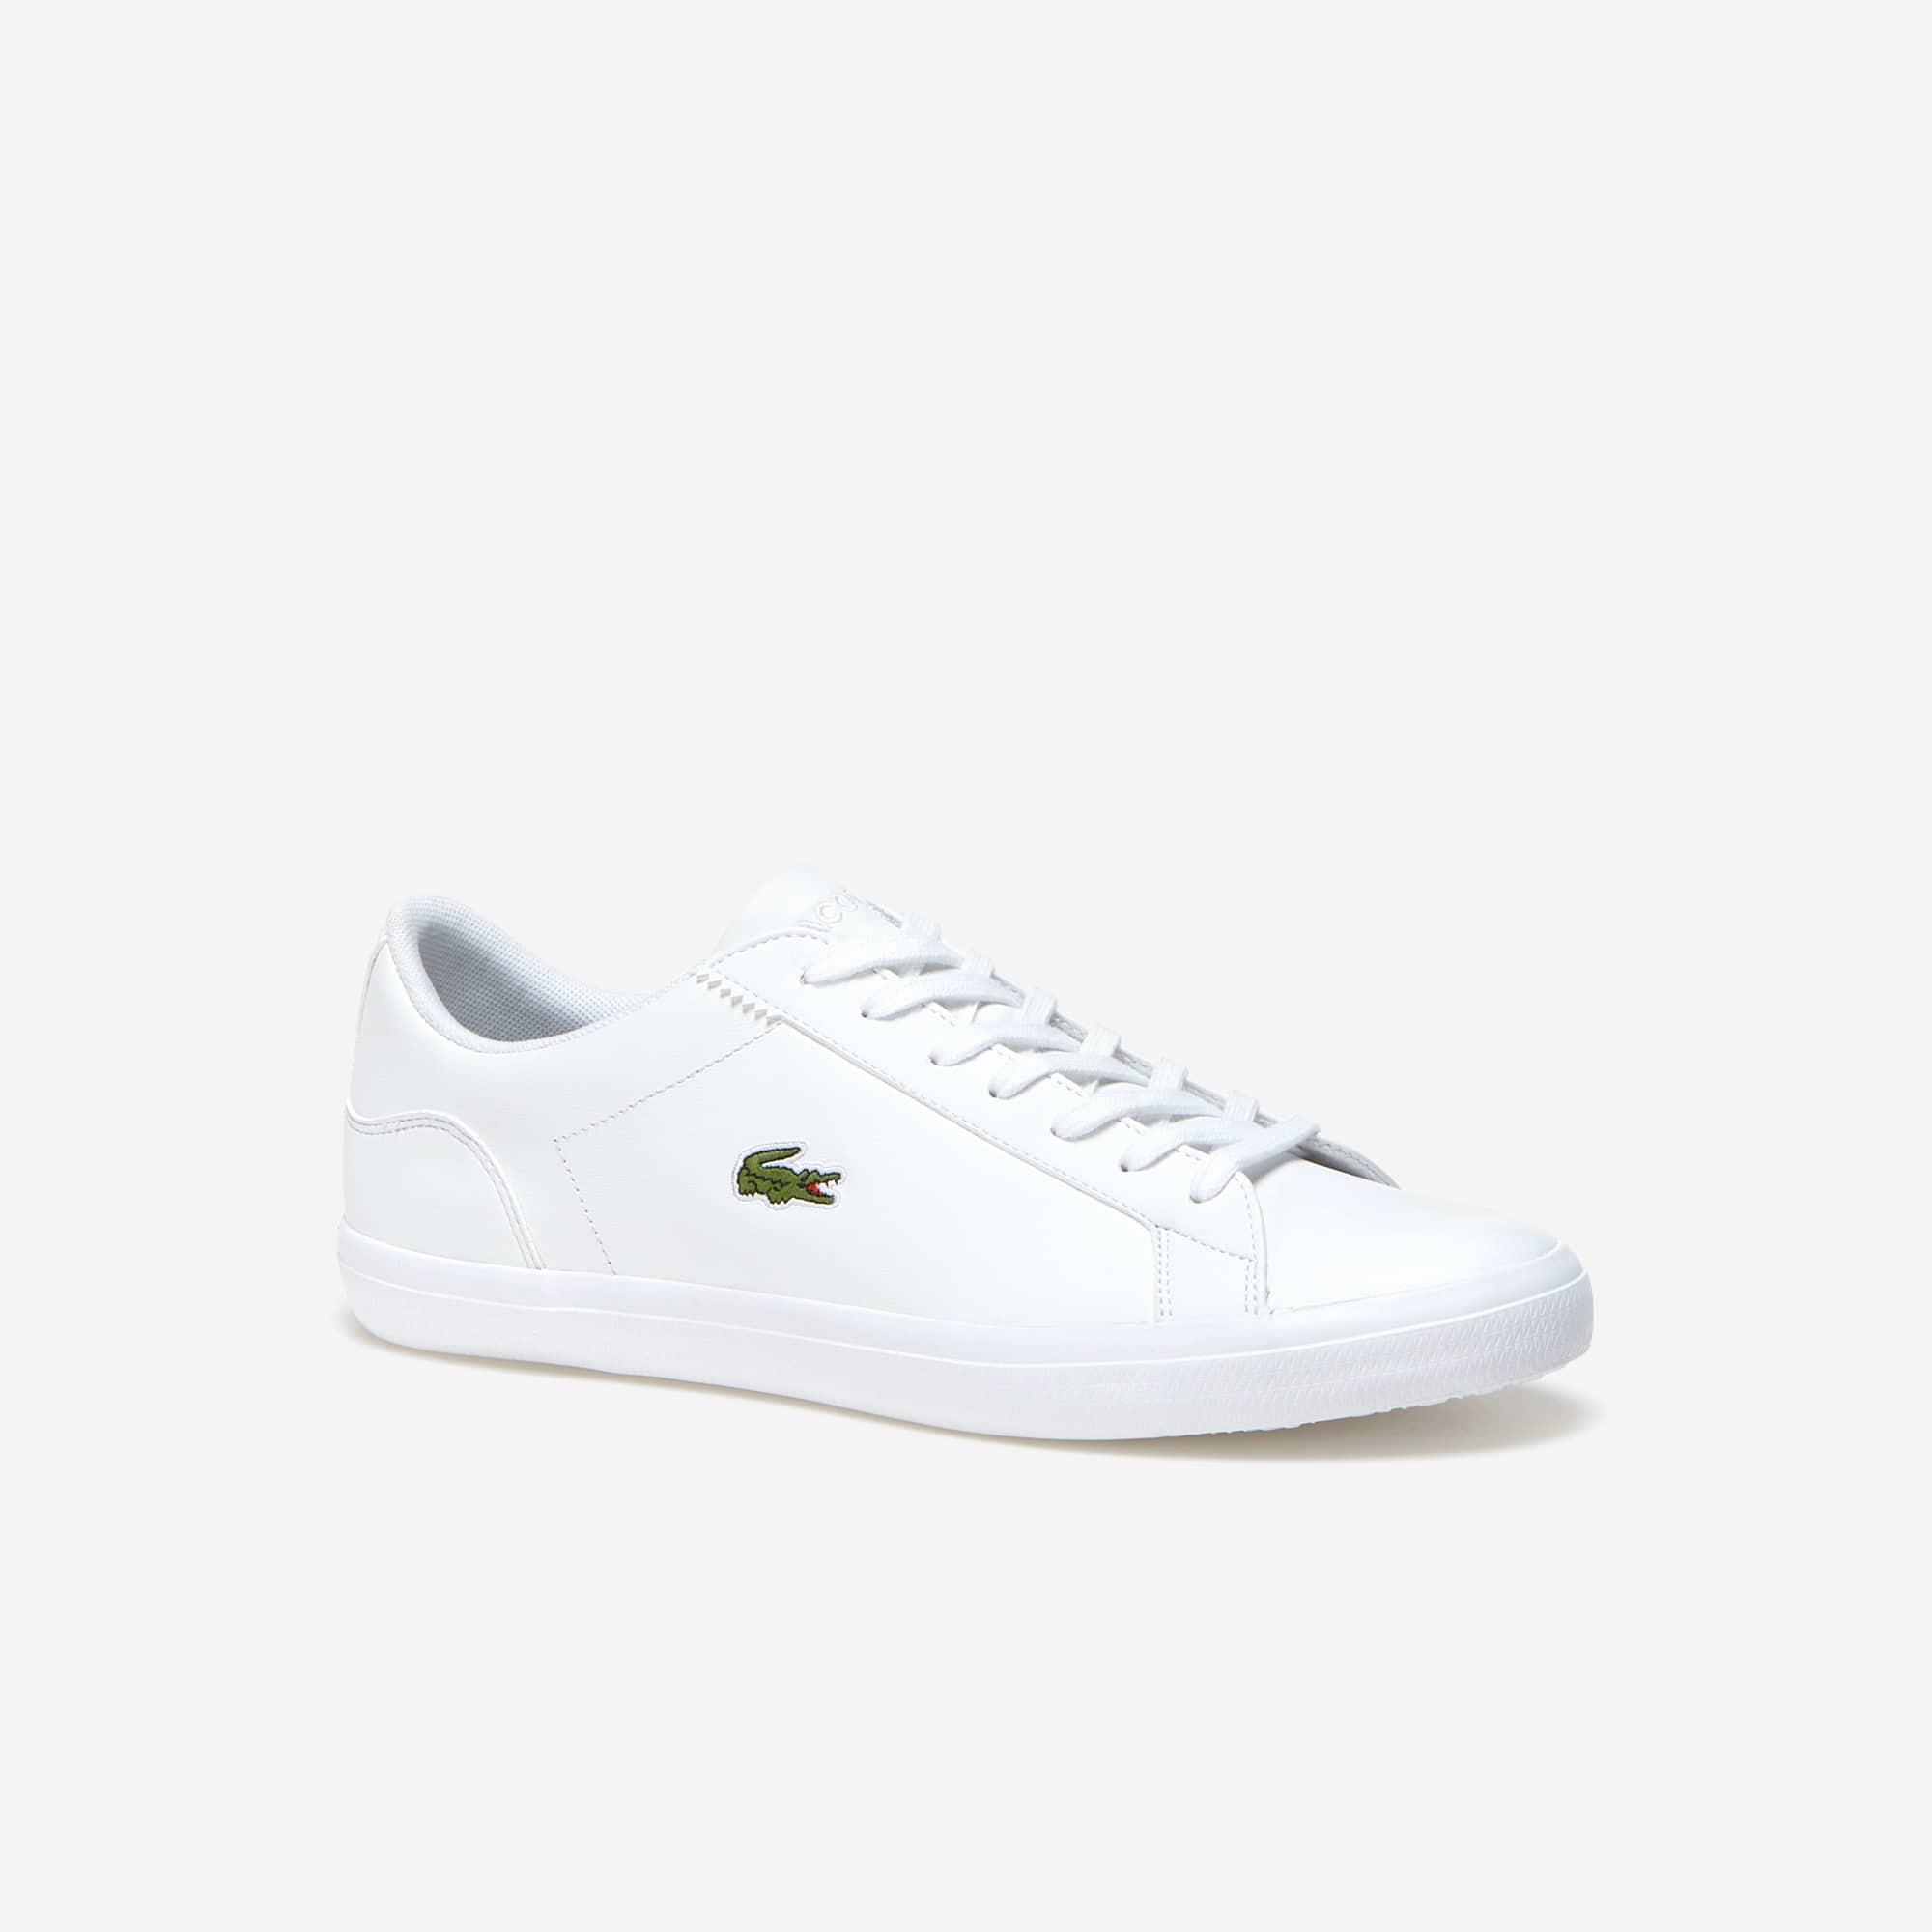 Sneakers Lerond in pelle monocroma